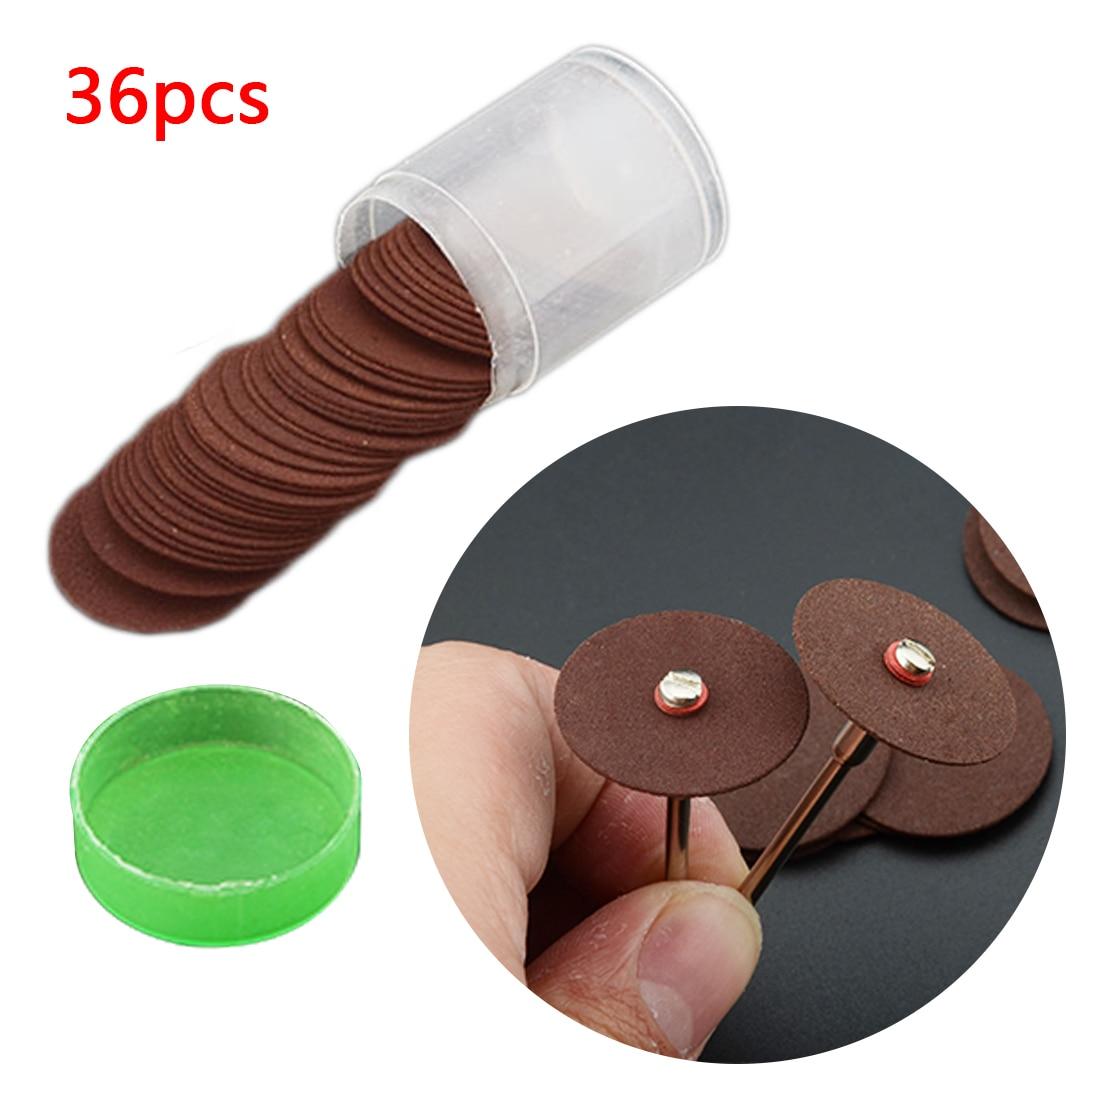 36pcs Dremel Accessories 24mm Abrasive Disc Cutting Discs Reinforced Cut Off Grinding Wheels Rotary Blade Disc Tool